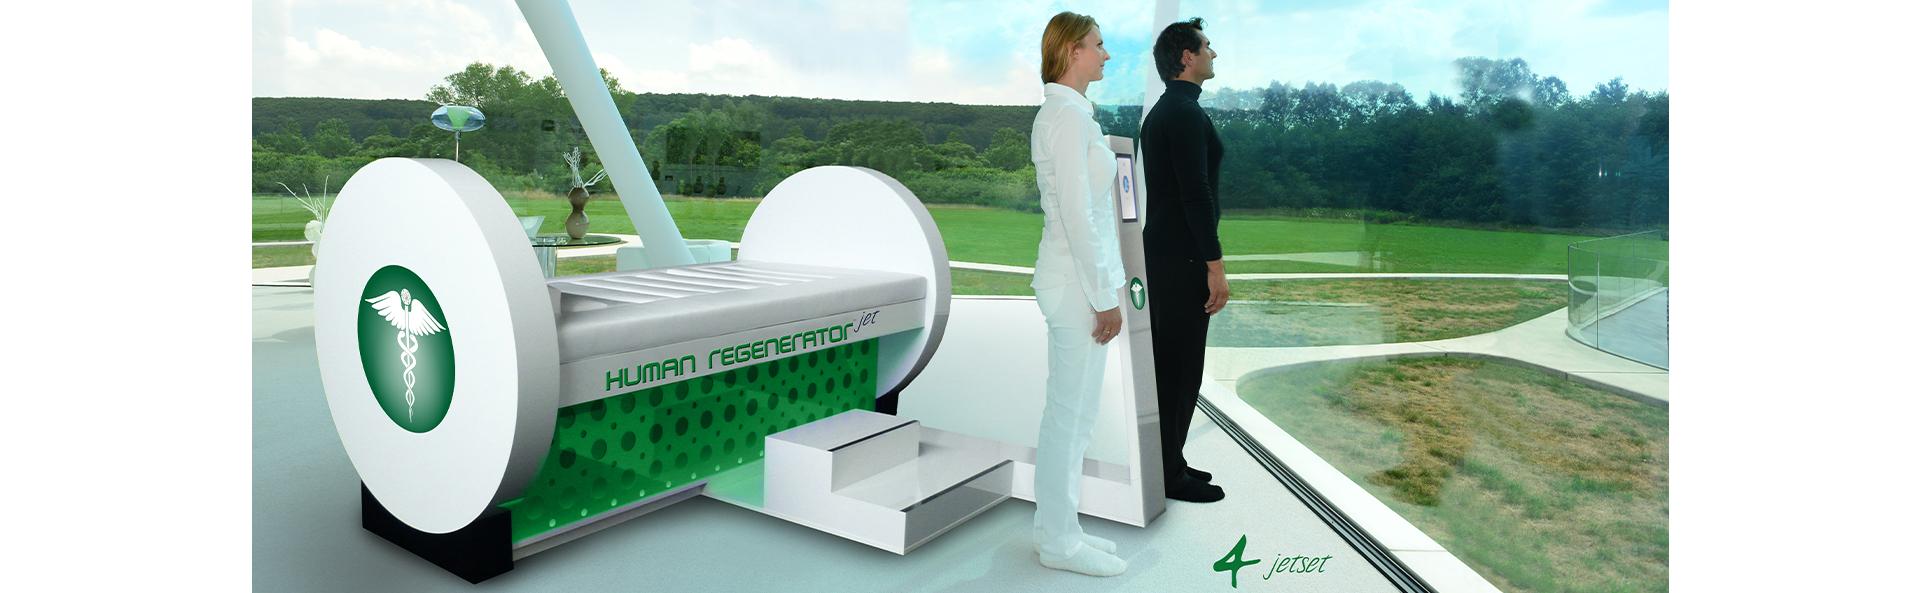 Human Regenerator Jet